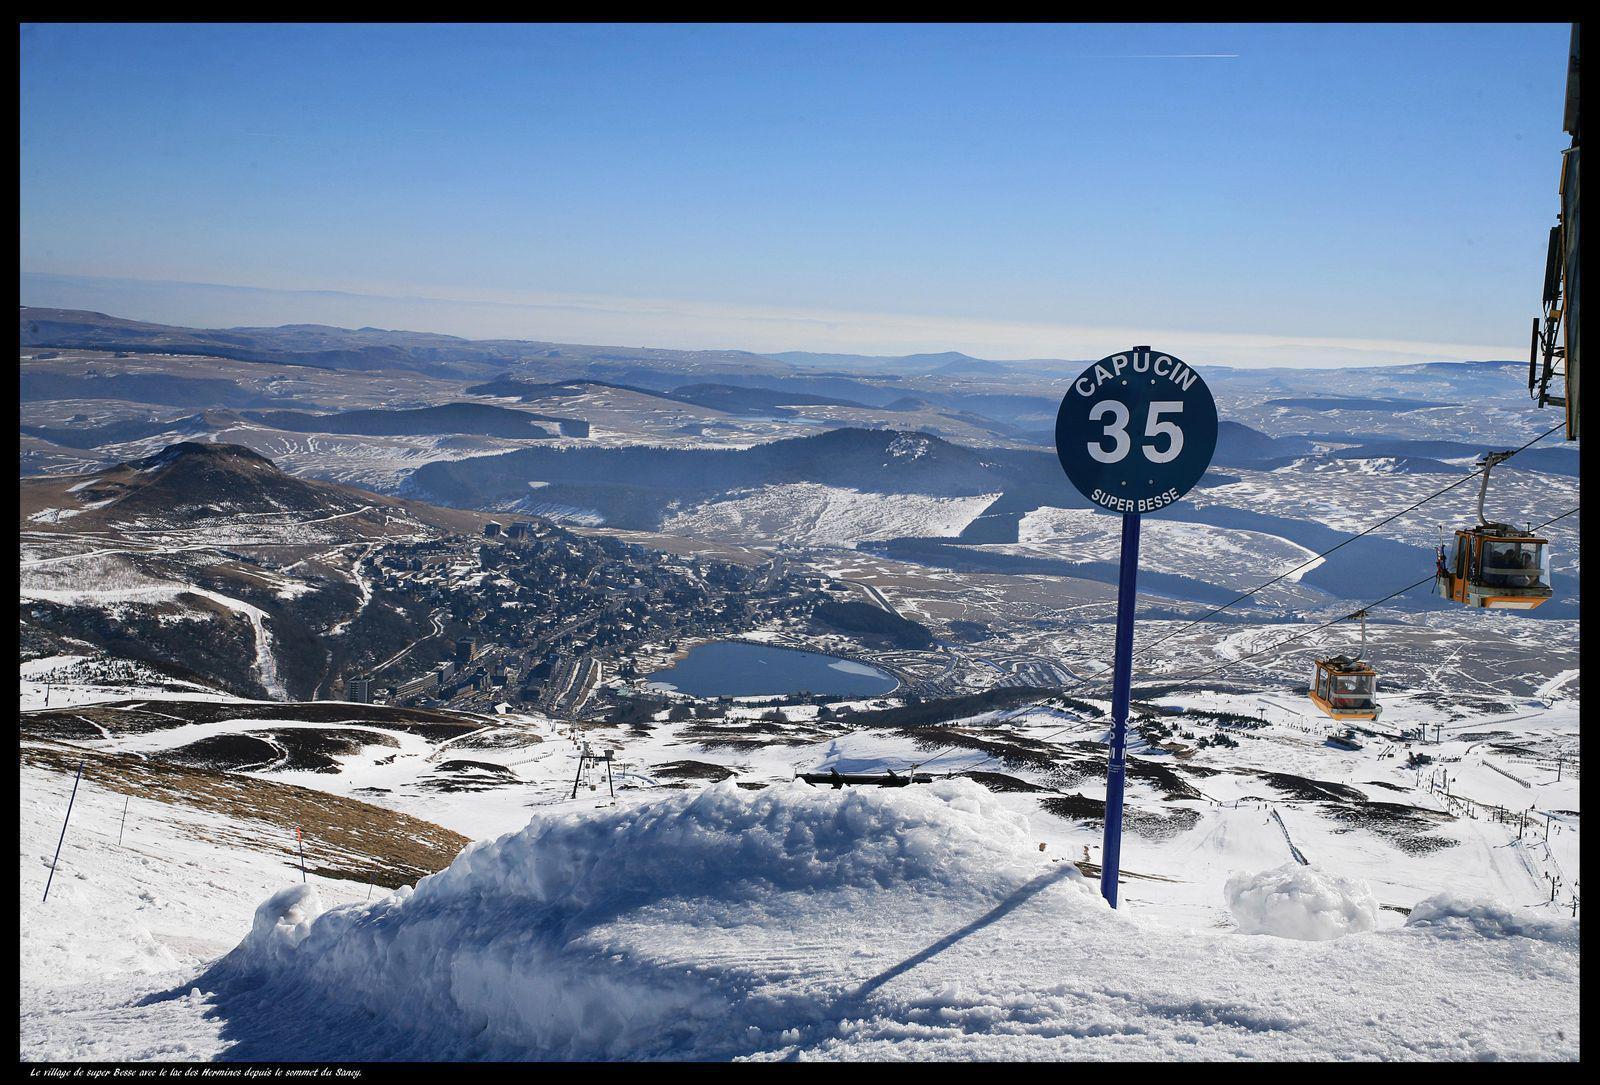 Station de ski de Besse Super Besse_Besse-et-Saint-Anastaise (1)